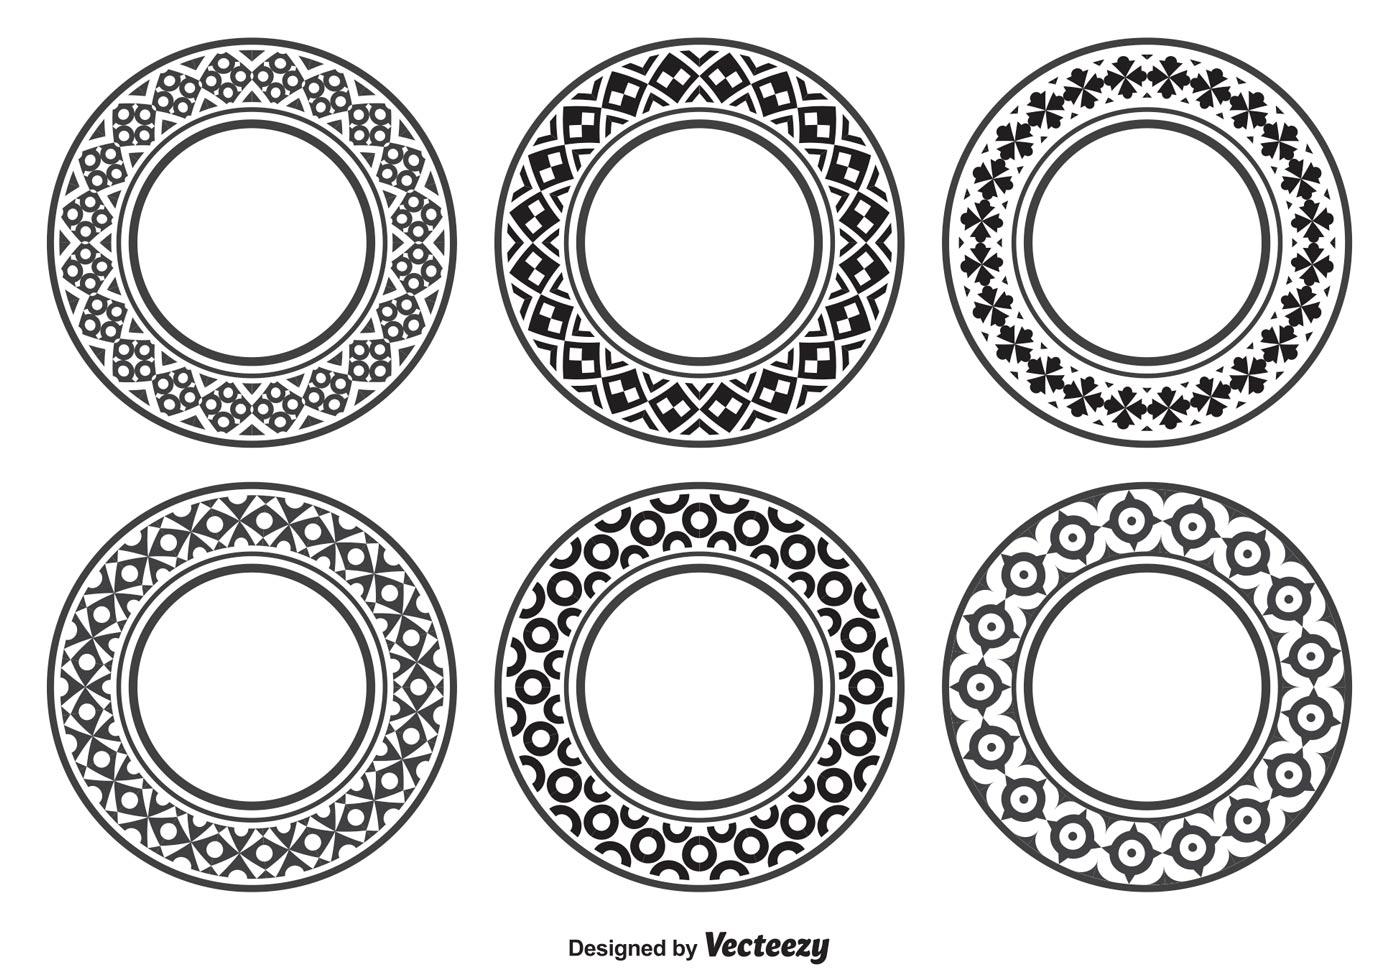 Decorative Circle Shapes